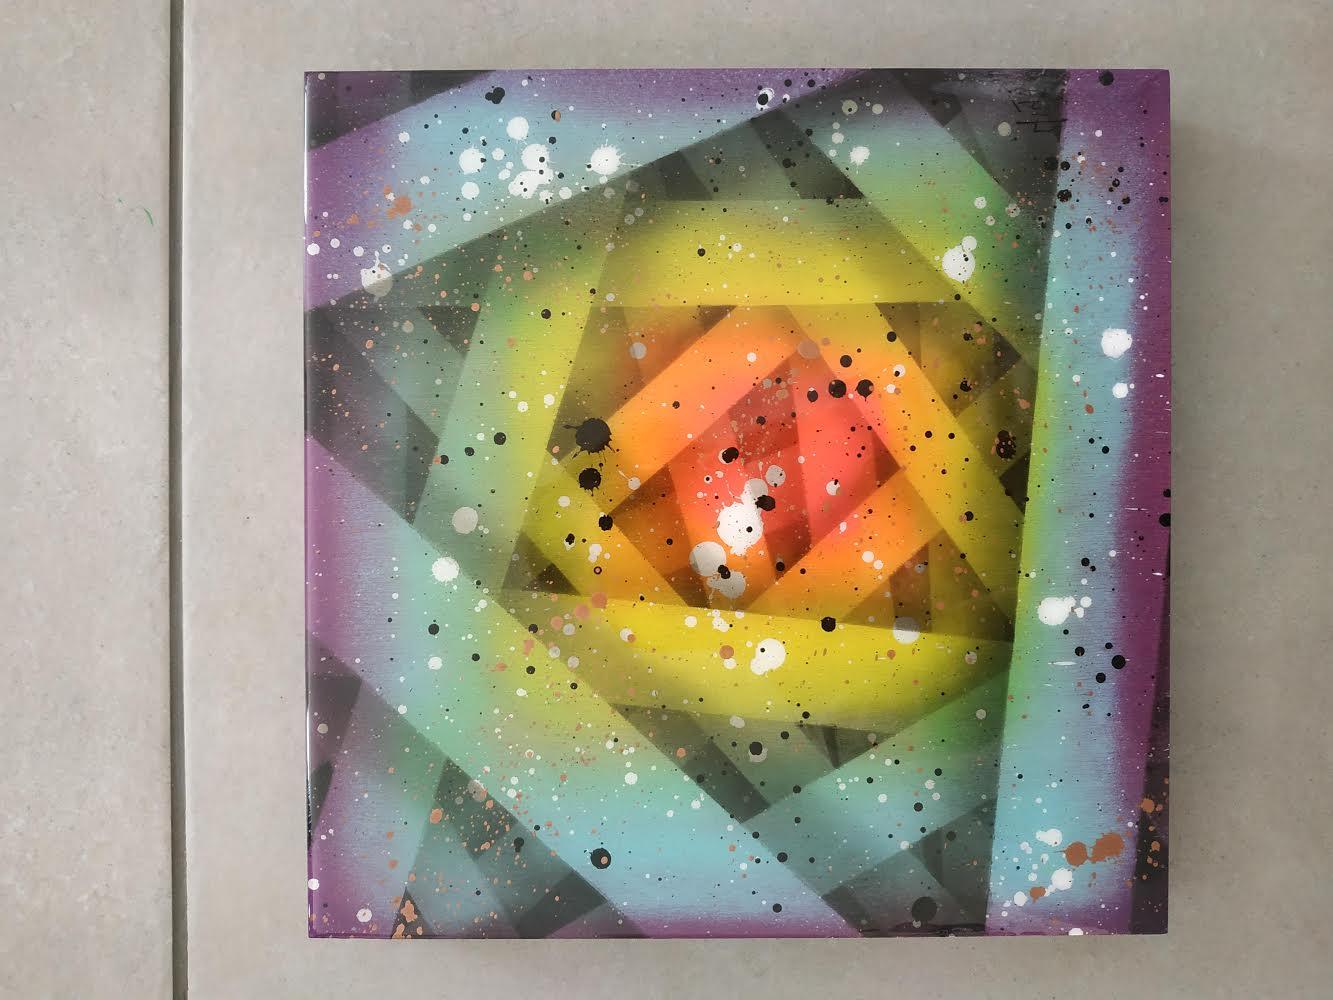 NINU 'COLOUR SPIRIT'-2021- ORIGINAL 1/1 - Image 10 of 11